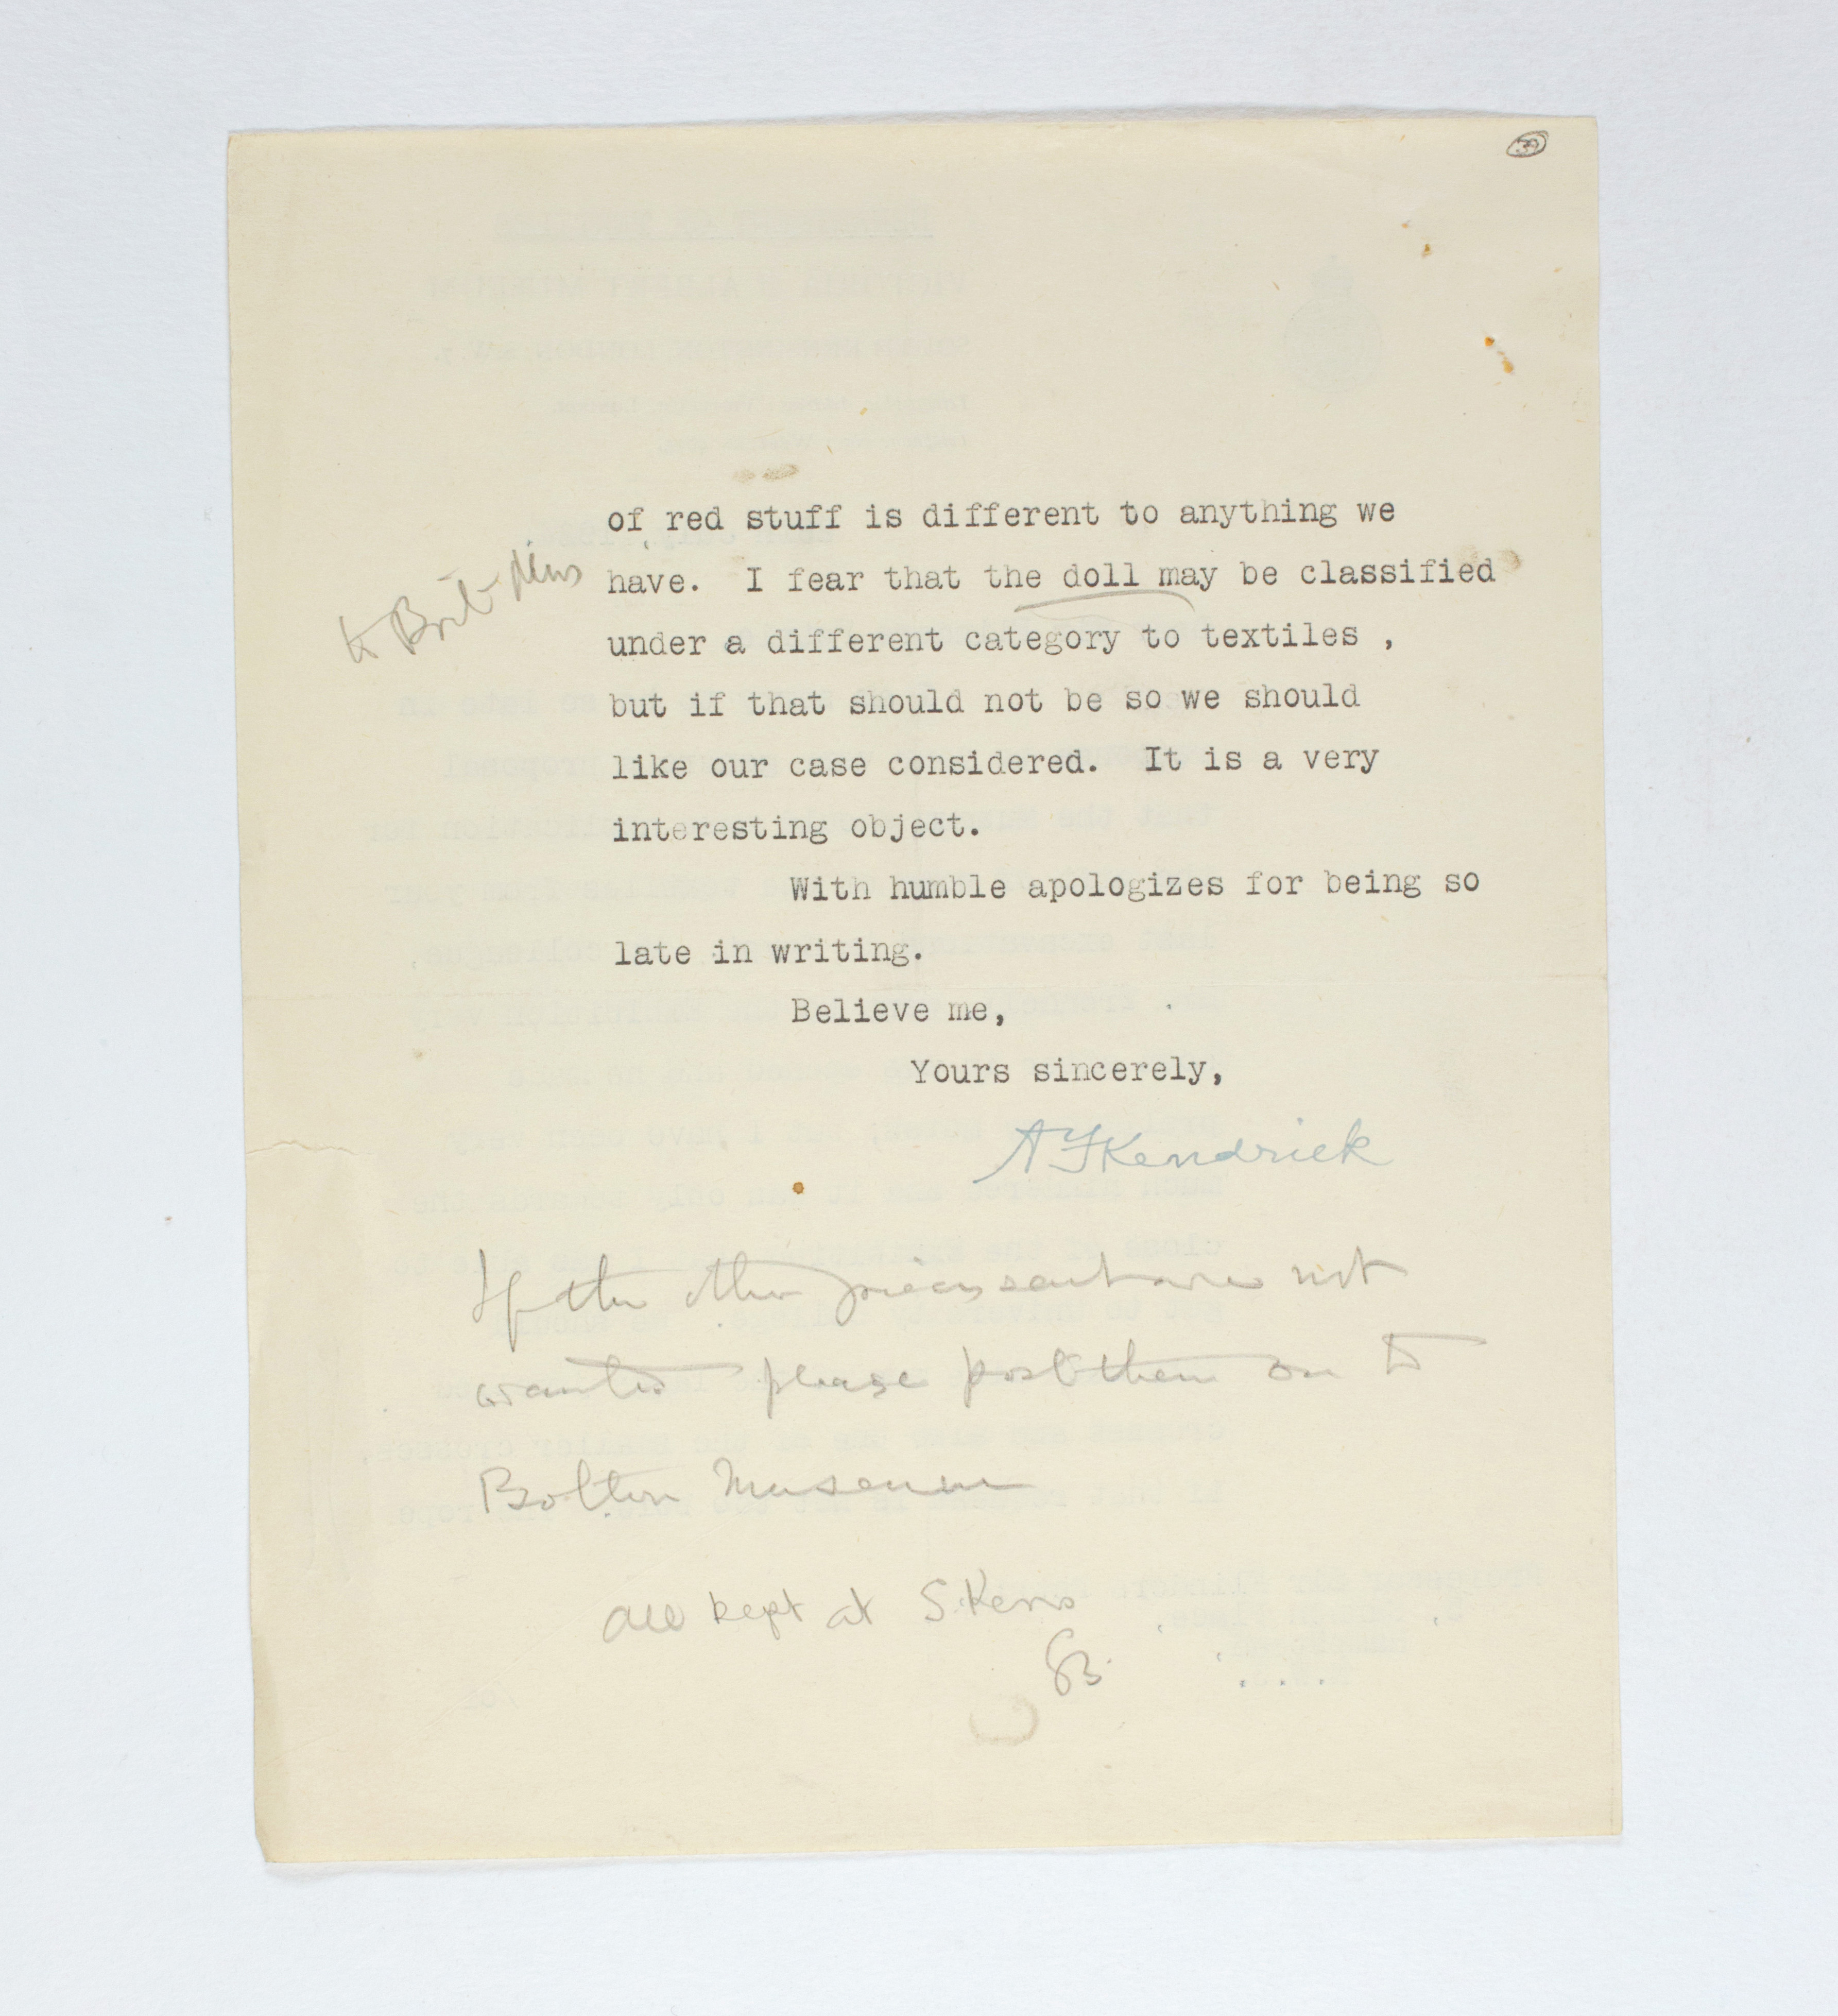 1923-24 Qau el-Kebir, Hemamieh Correspondence PMA/WFP1/D/27/39.2